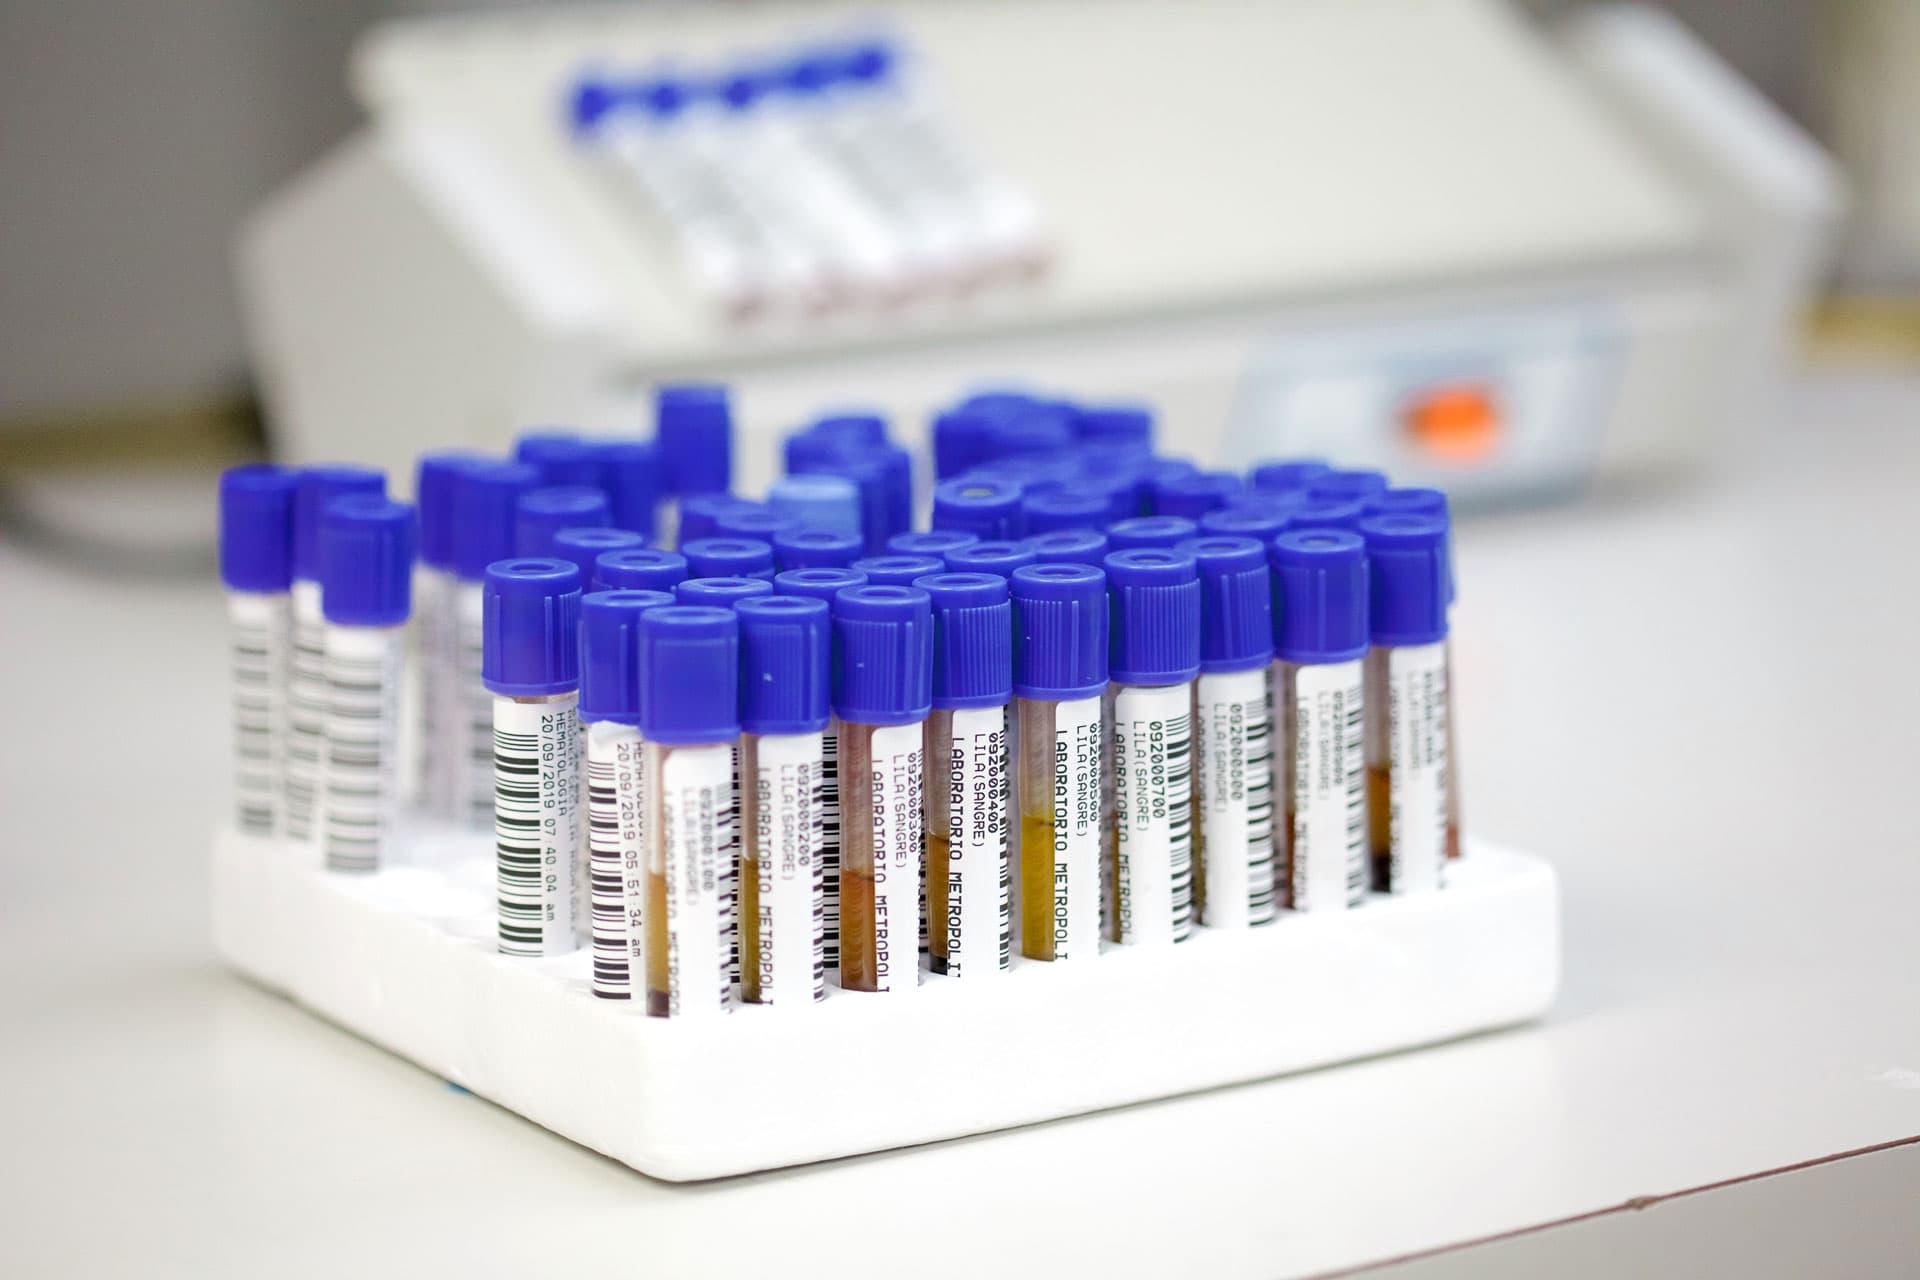 Cancer prostata psa 40 rmn hipertrofie prostatica